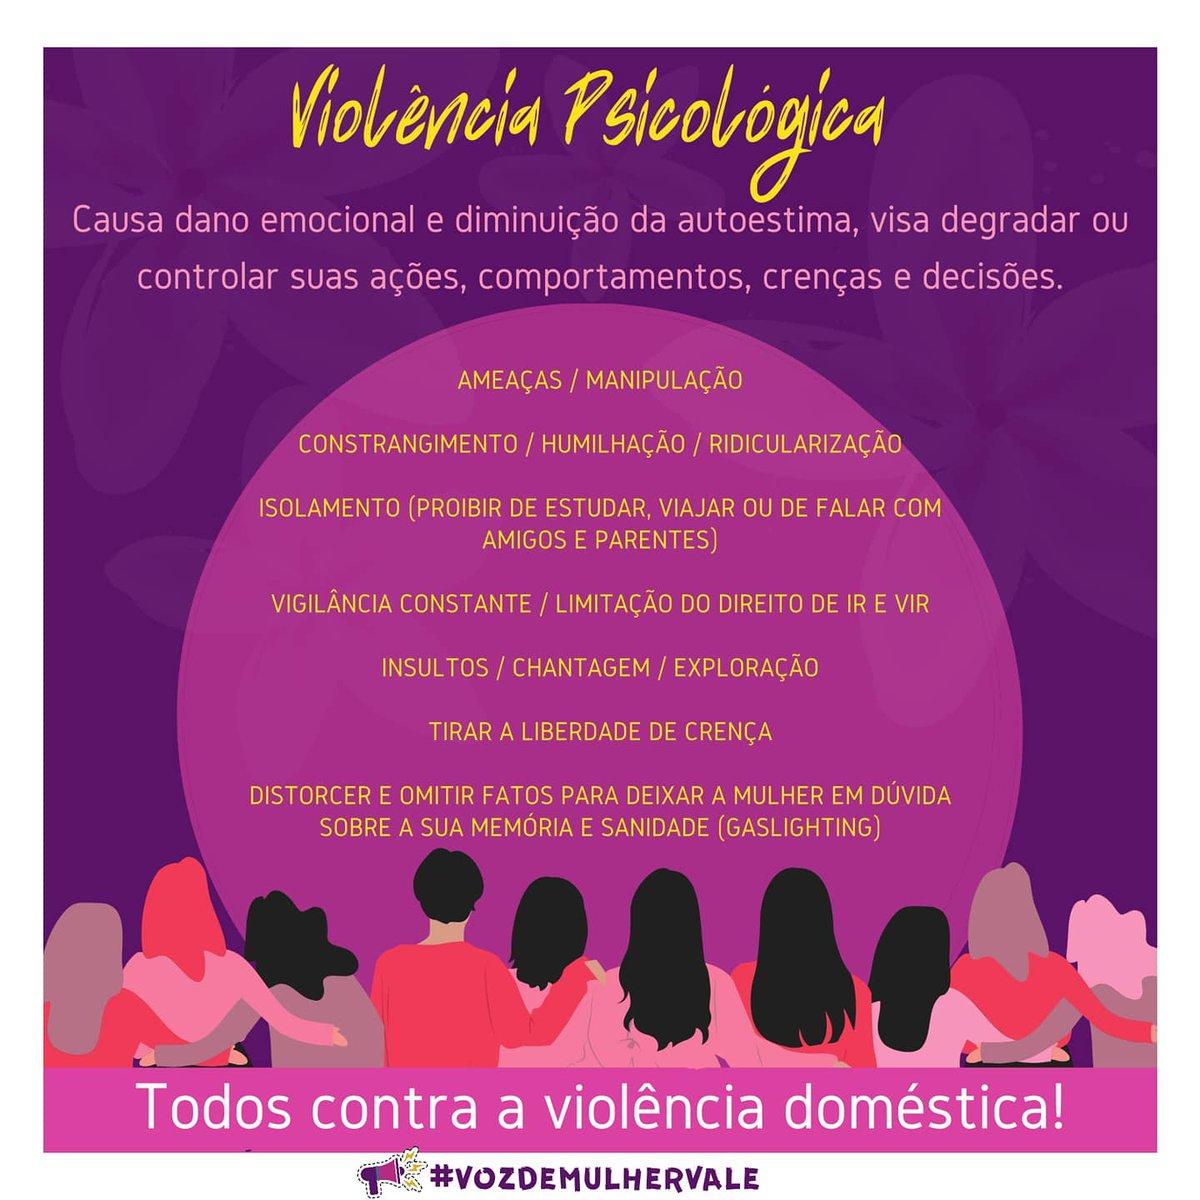 #violênciapsicologica pic.twitter.com/CM1w5Zxn2L